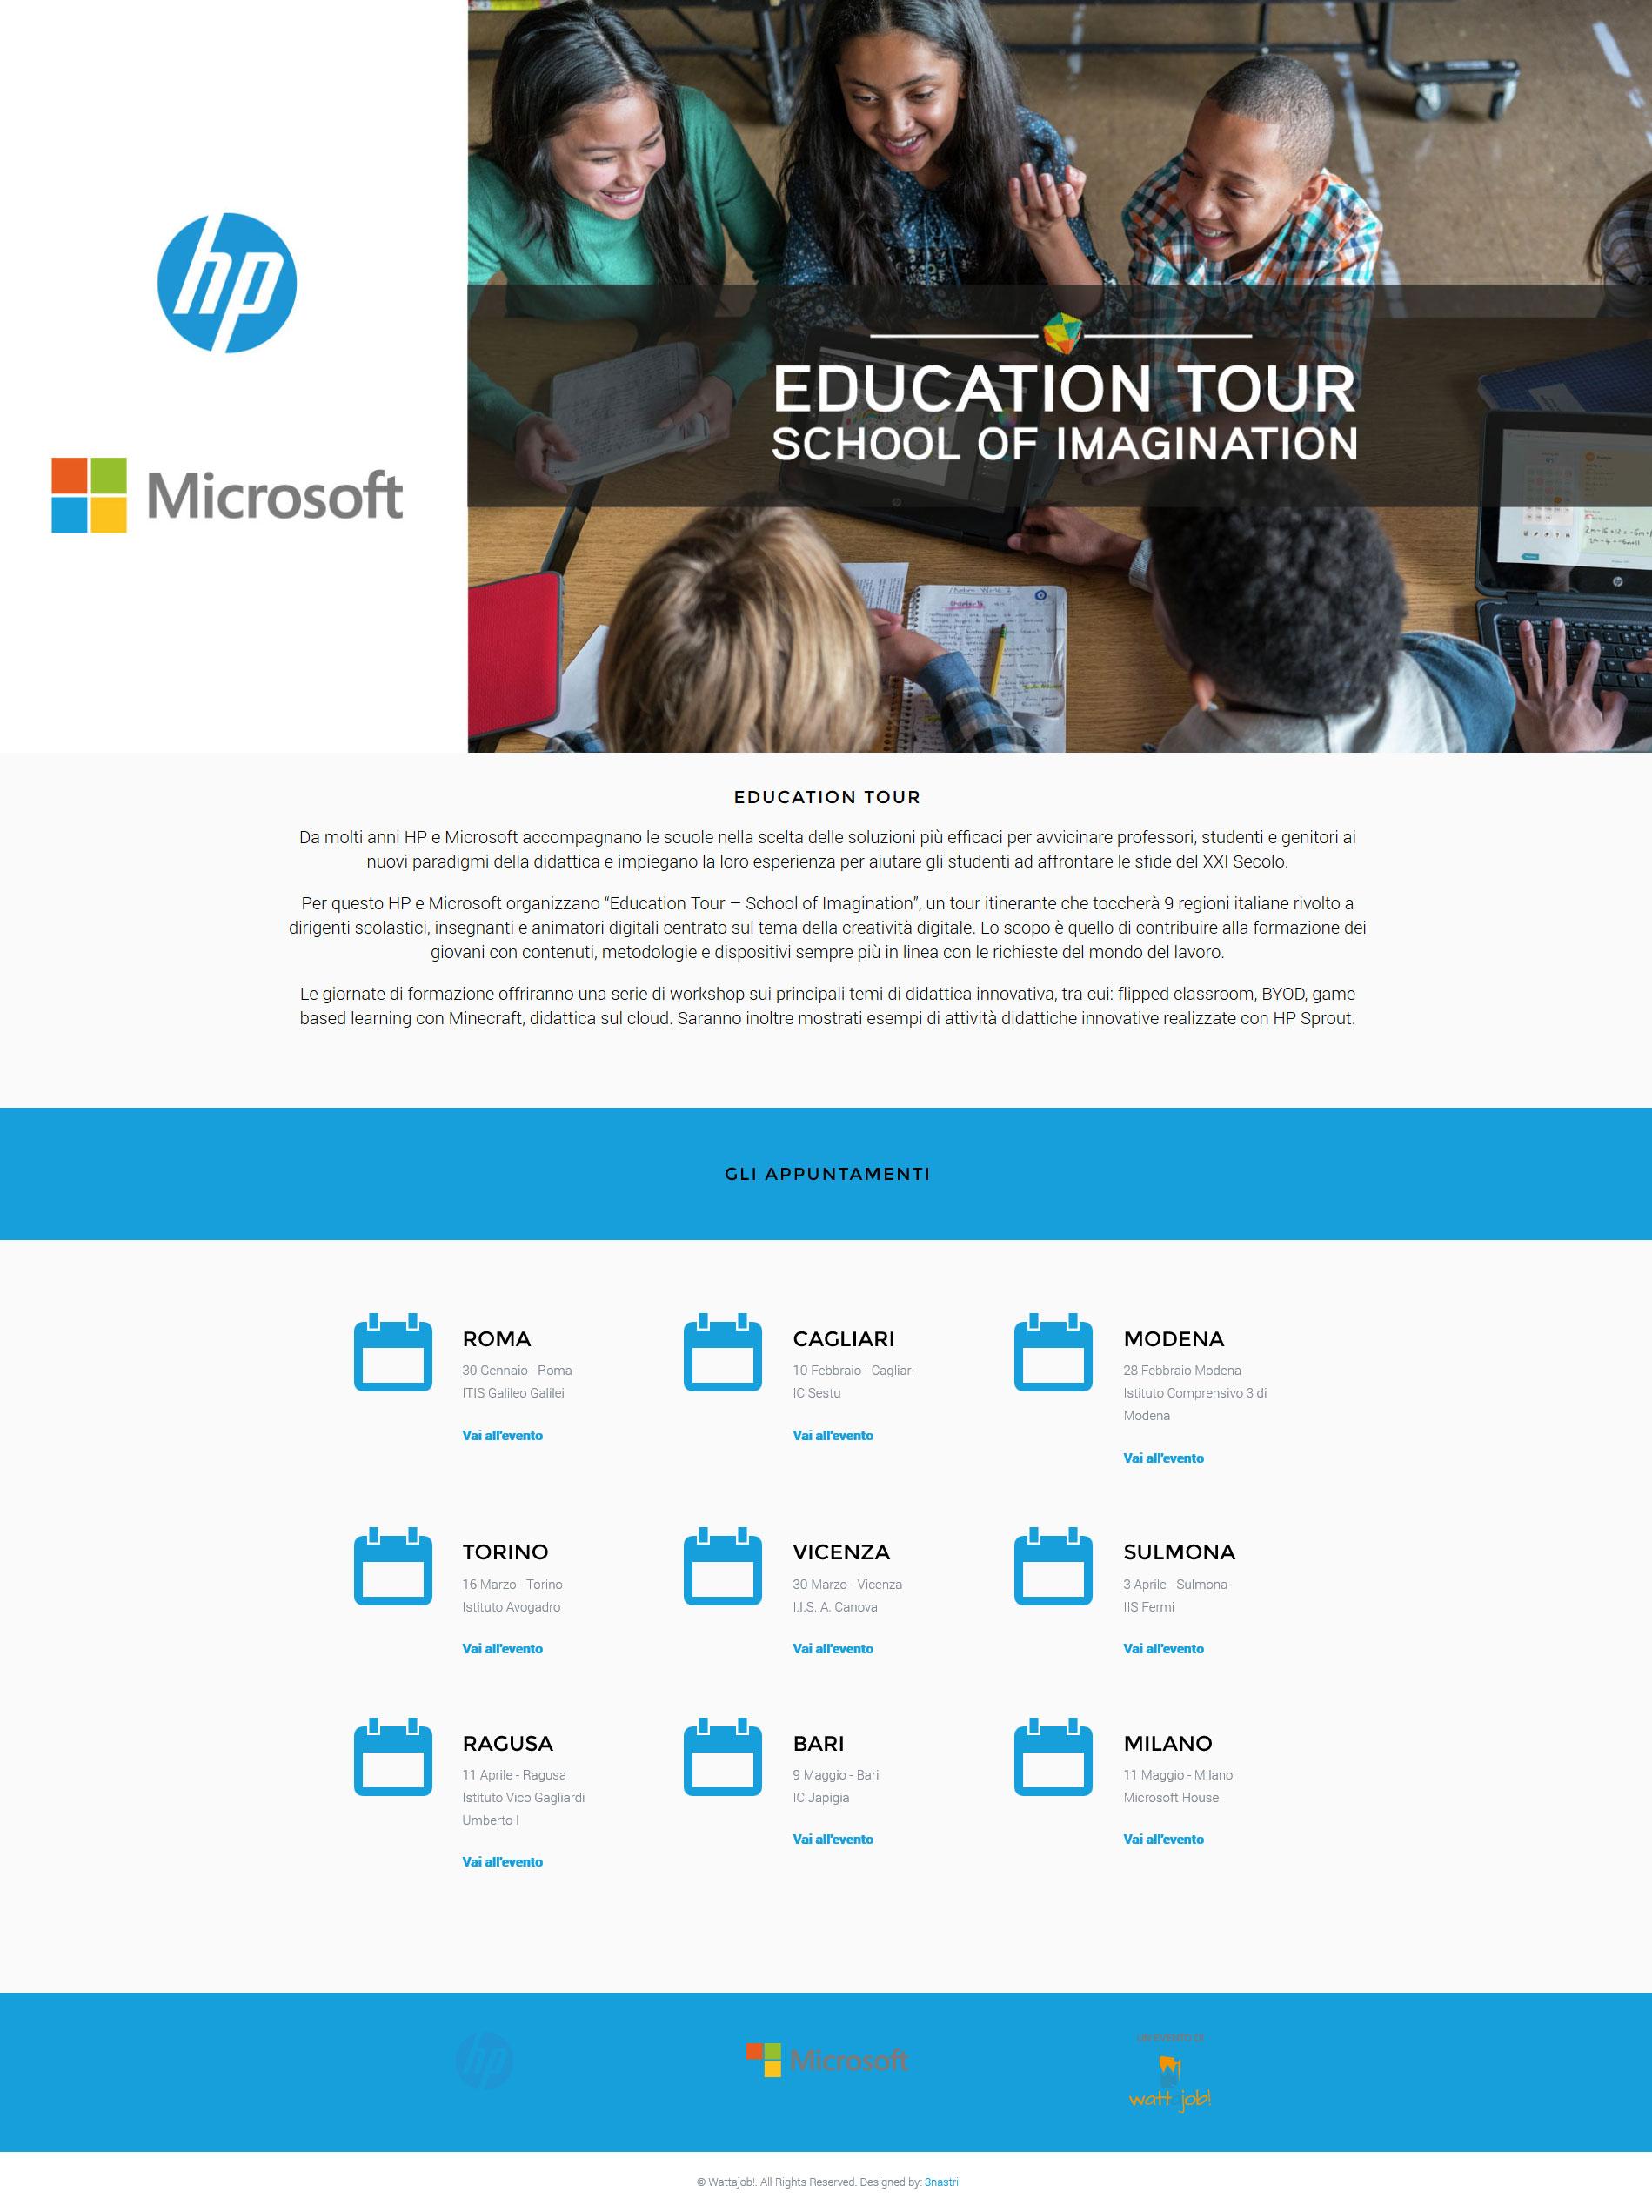 landing-page-education-tour-microsoft-hp